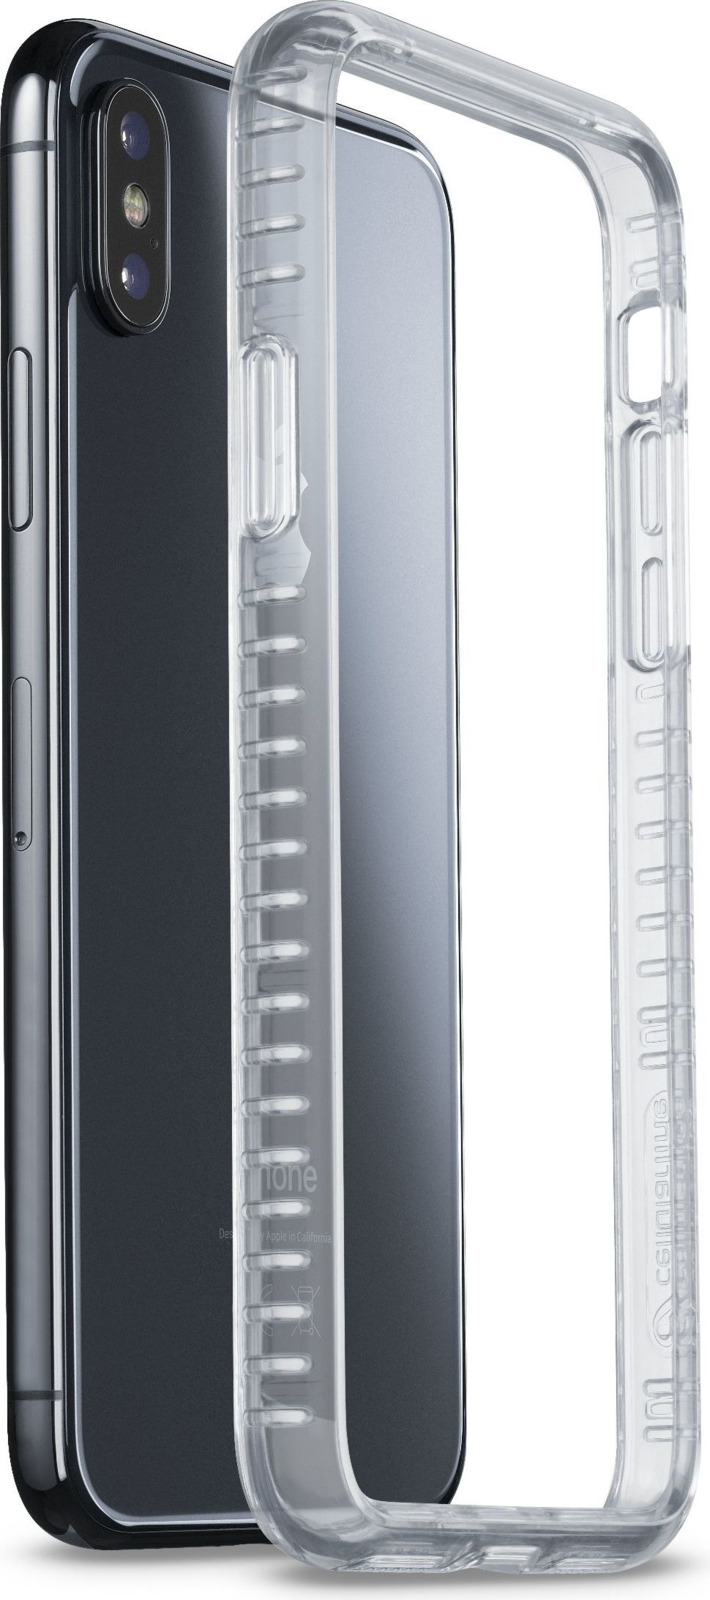 Фото - Чехол-бампер Cellularline для Apple iPhone X, AIRFRAMEIPH8XT, прозрачный чехол для iphone xs max cellularline clear duo прозрачный